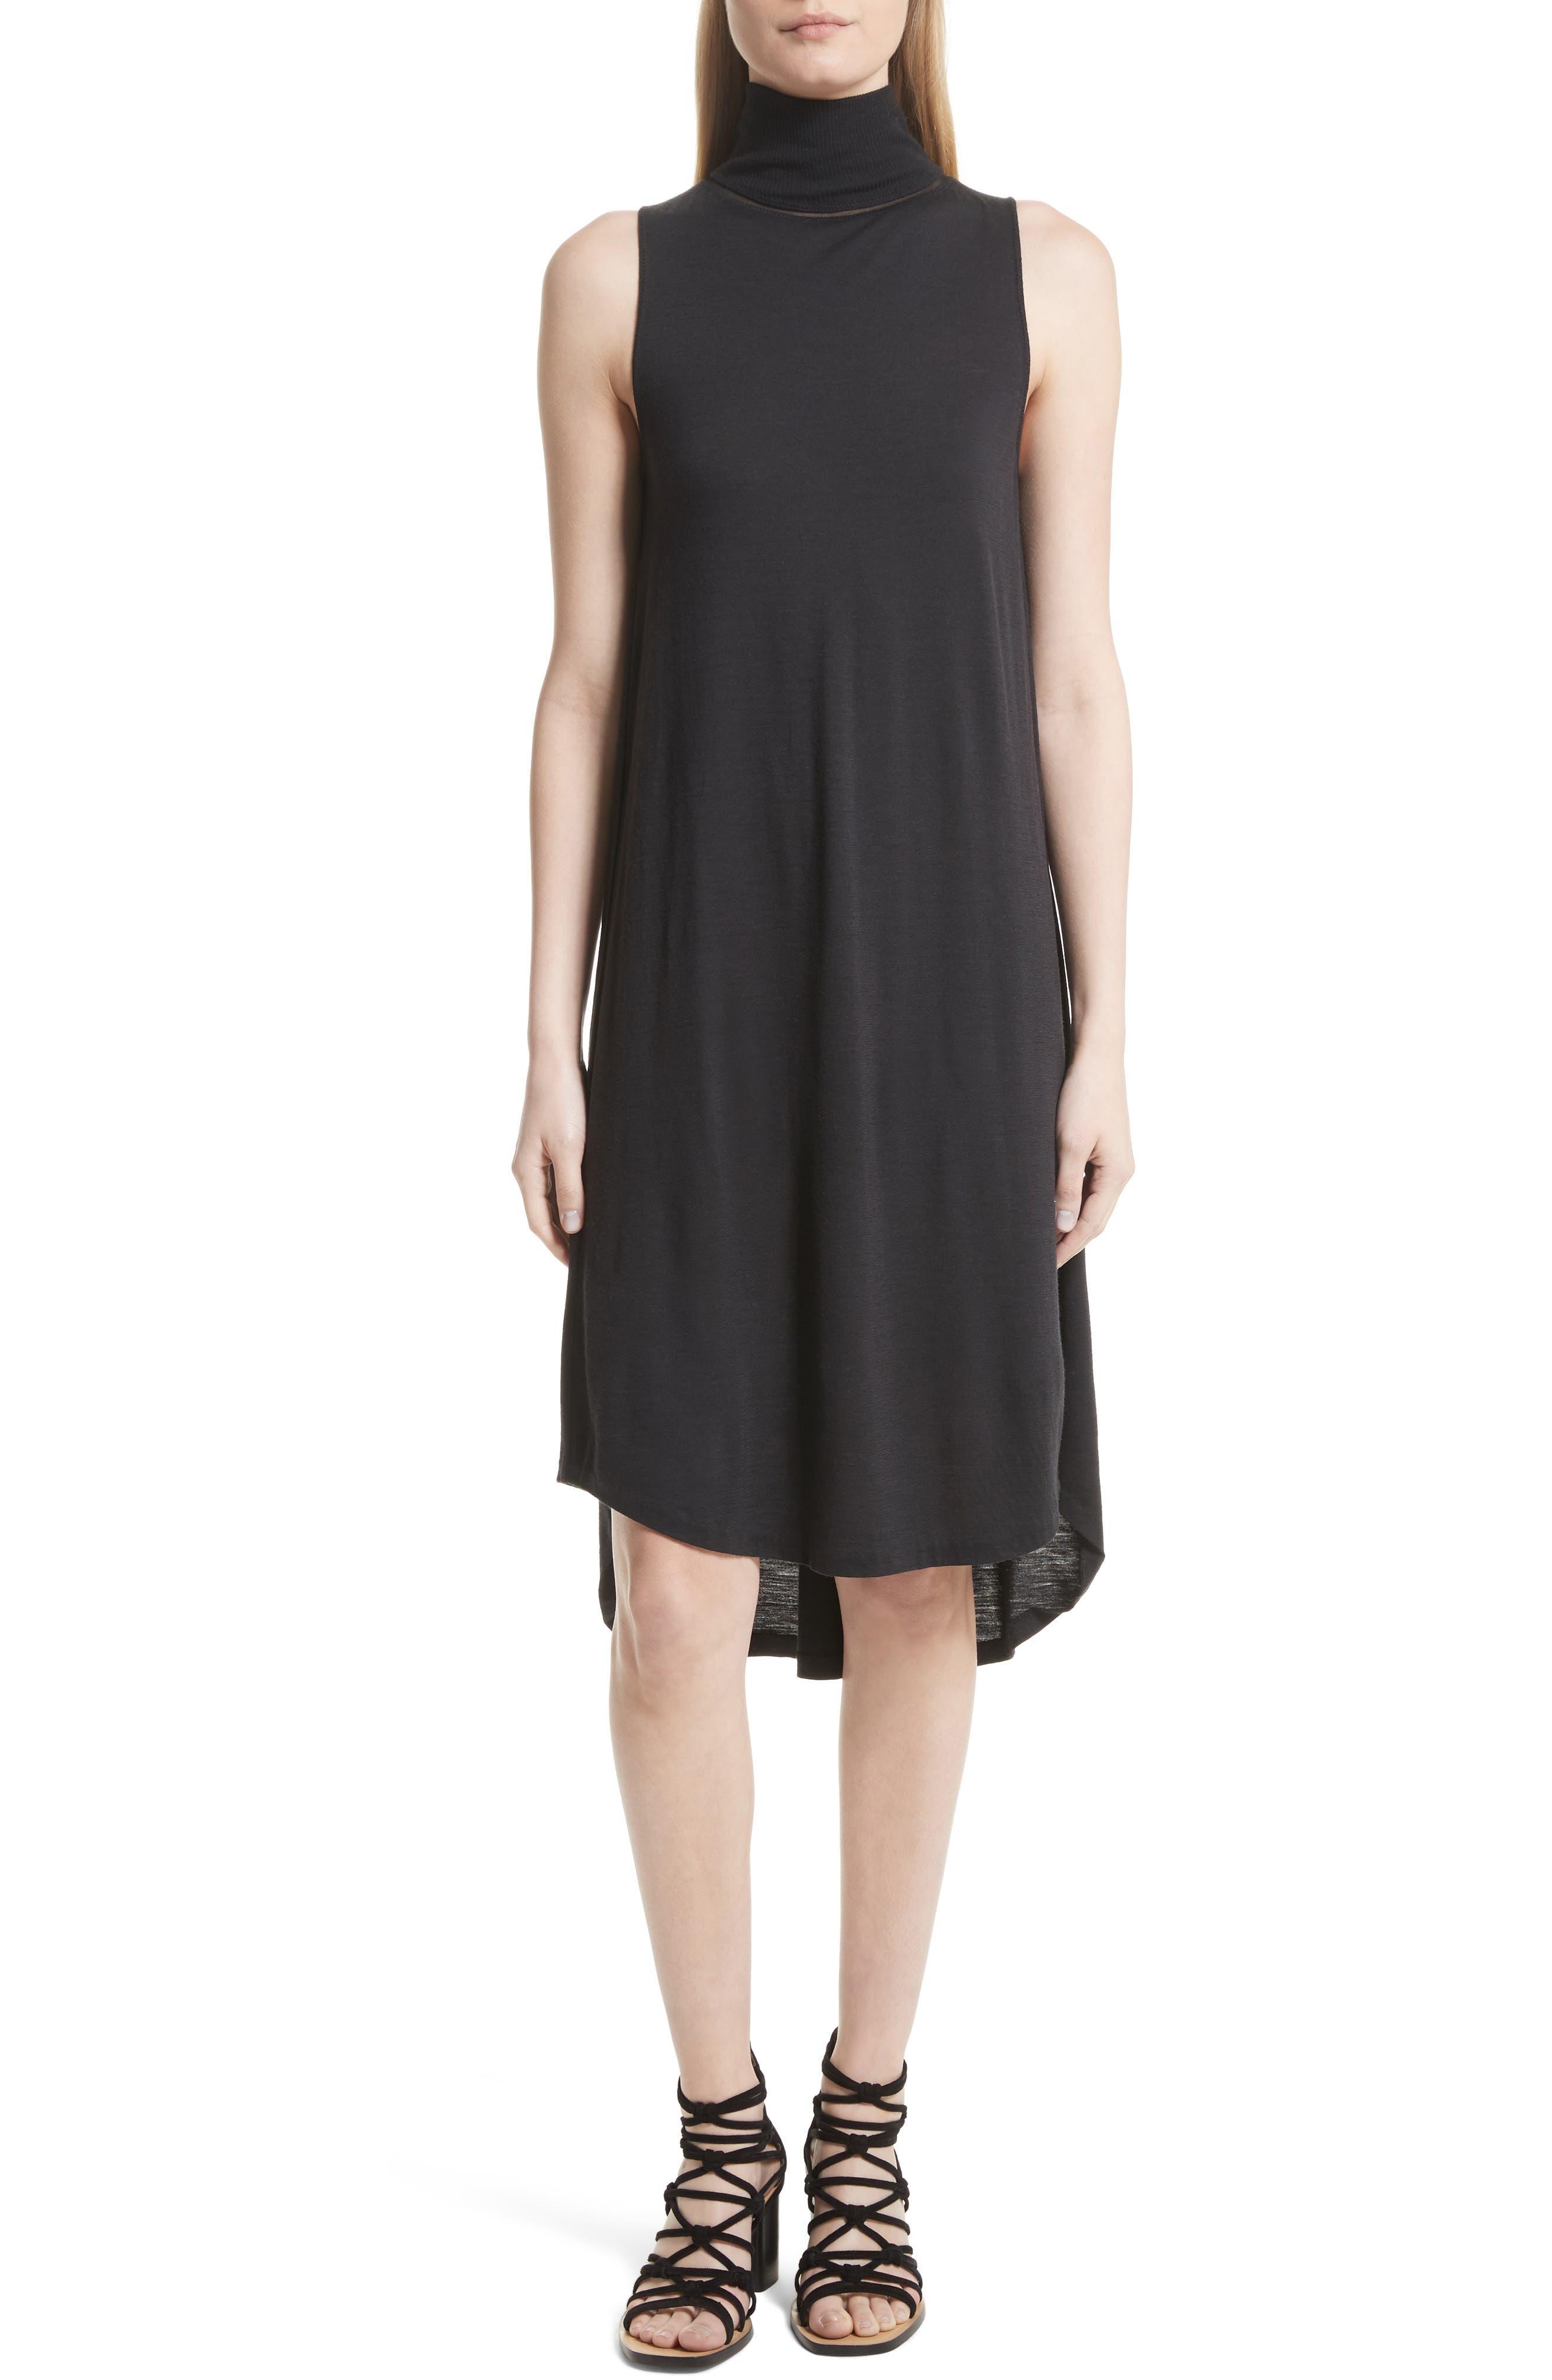 Alternate Image 1 Selected - rag & bone Nova Wool Turtleneck Dress